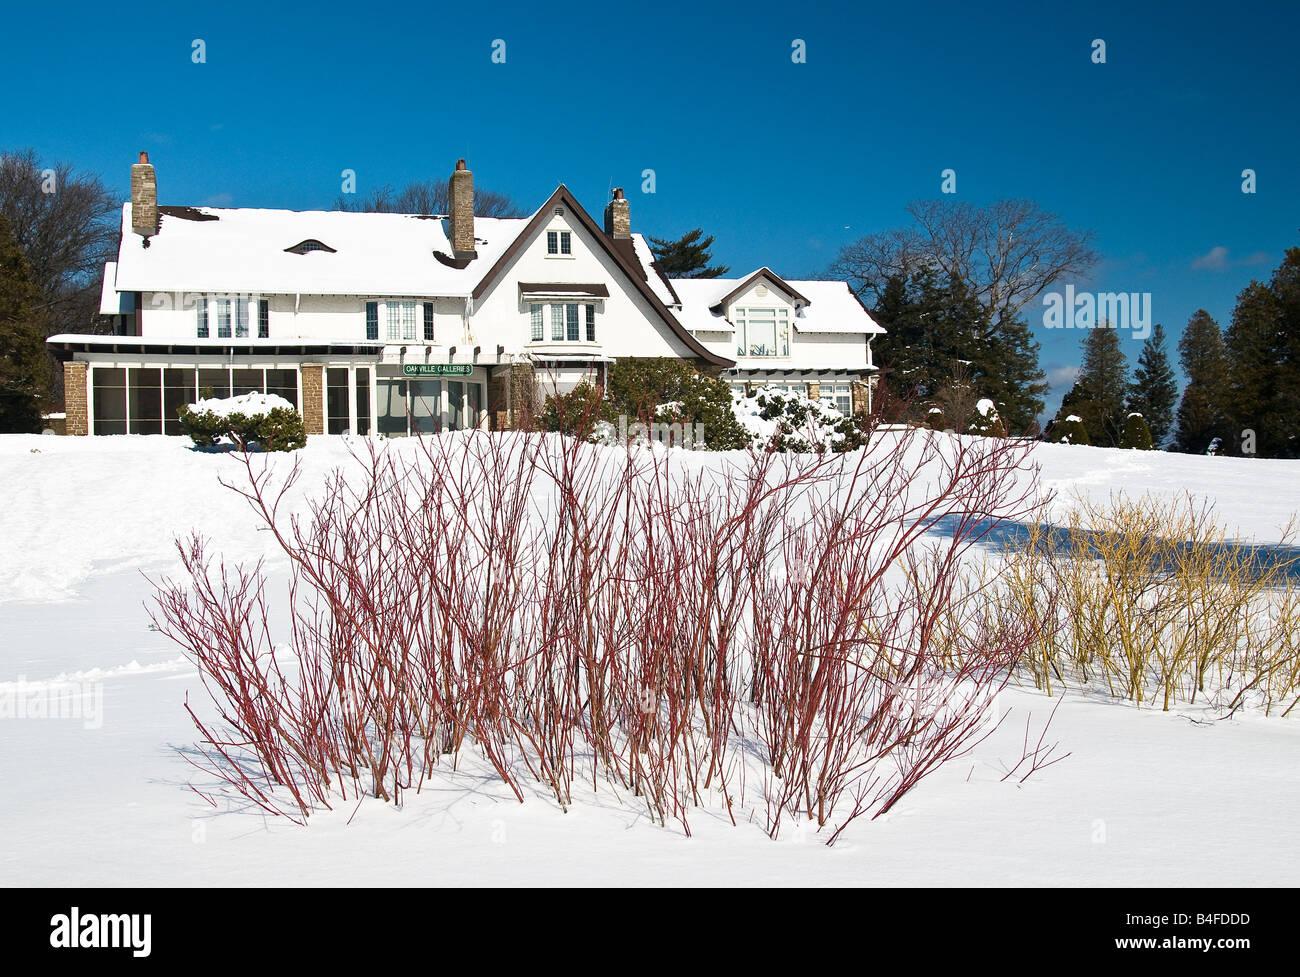 A brisk winter scene at Gairloch Gardens Oakville Ontario Canada - Stock Image